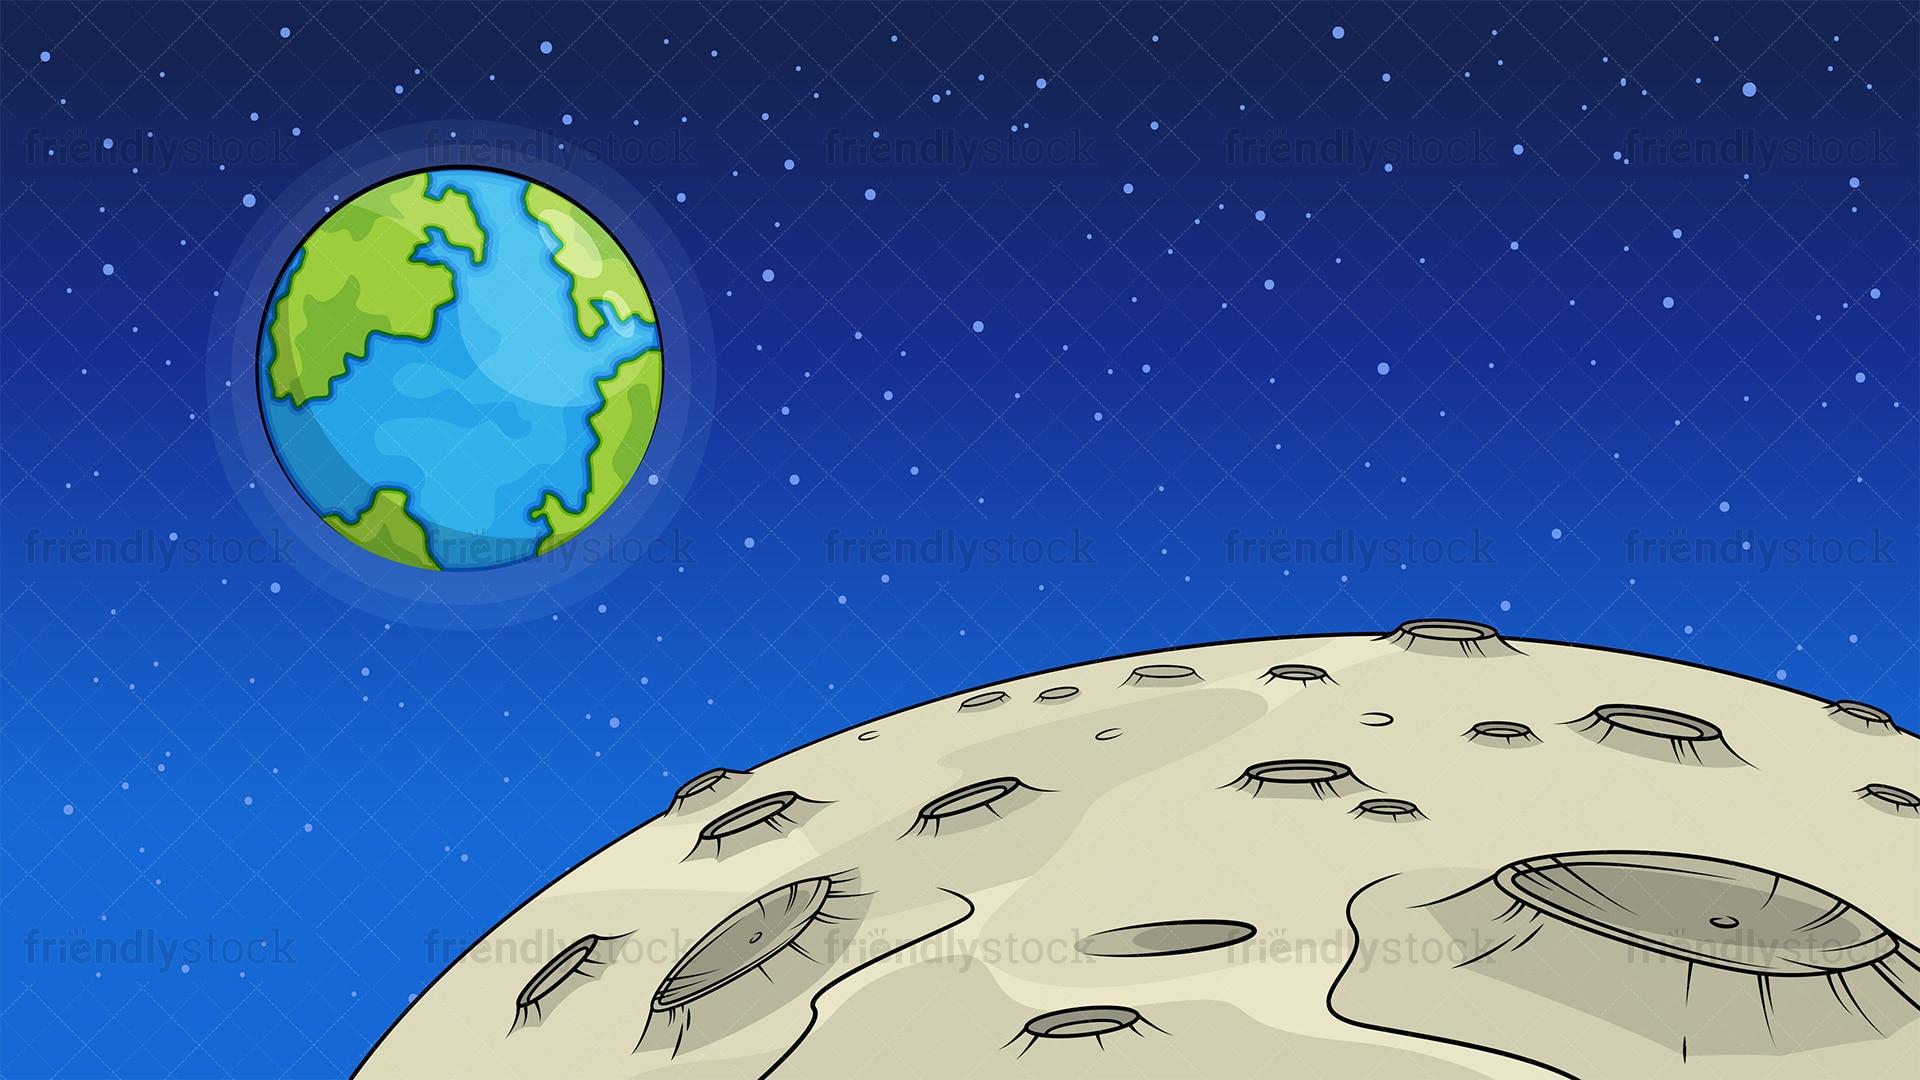 Moon Surface Background Cartoon Clipart Vector - FriendlyStock (1920 x 1080 Pixel)